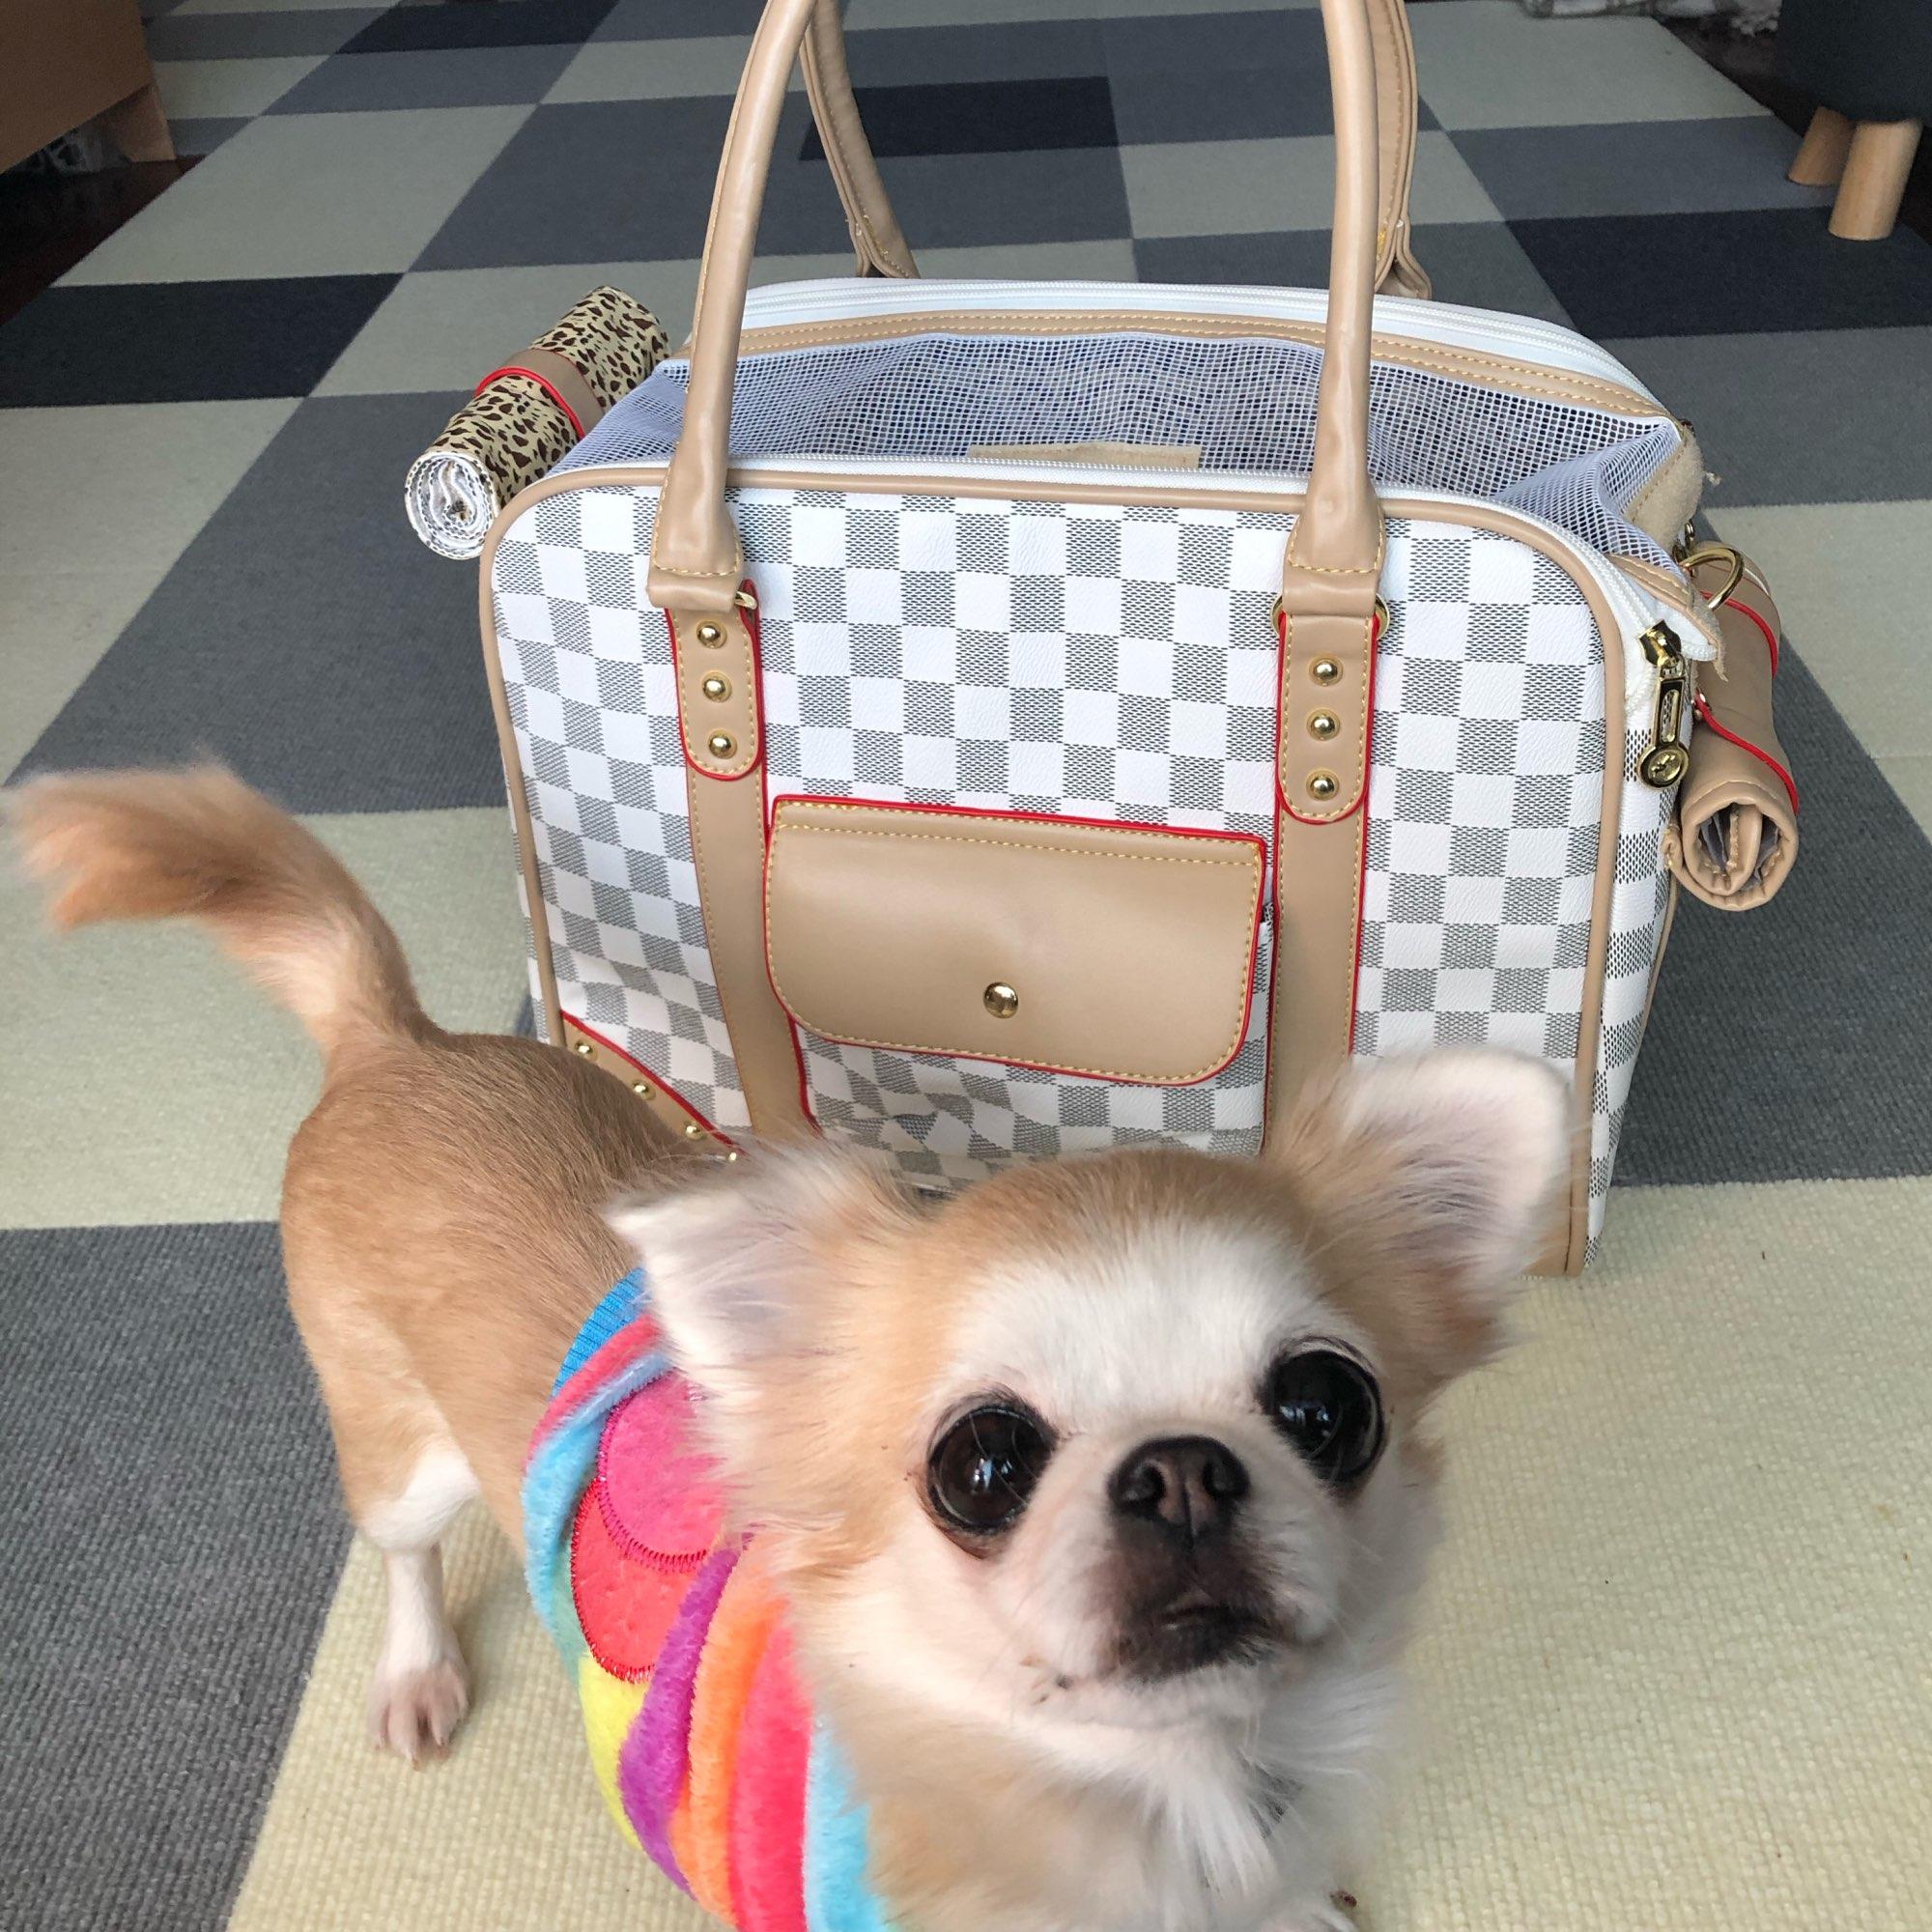 DogMEGA Dog Carrier Backpacks | Dog Travel Carrier | Dog Carrier Backpack Airline Approved photo review